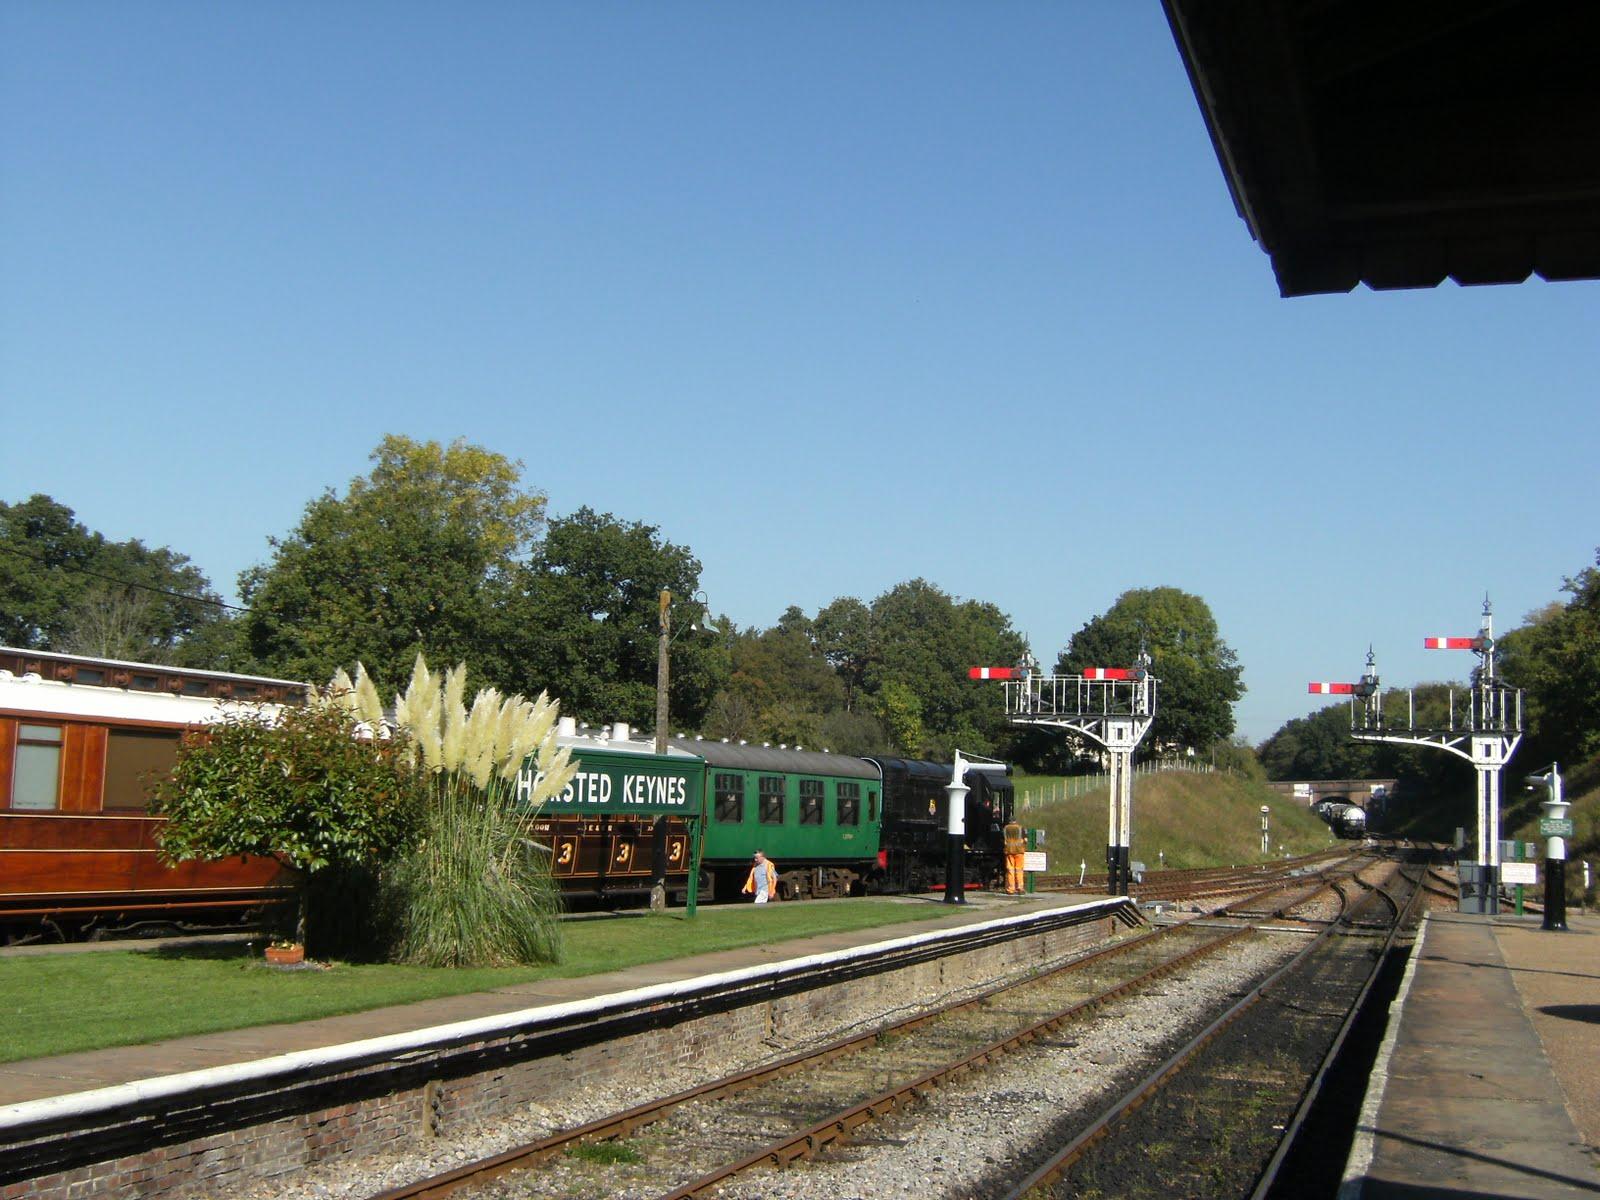 DSCF9733 Horsted Keynes station, looking north